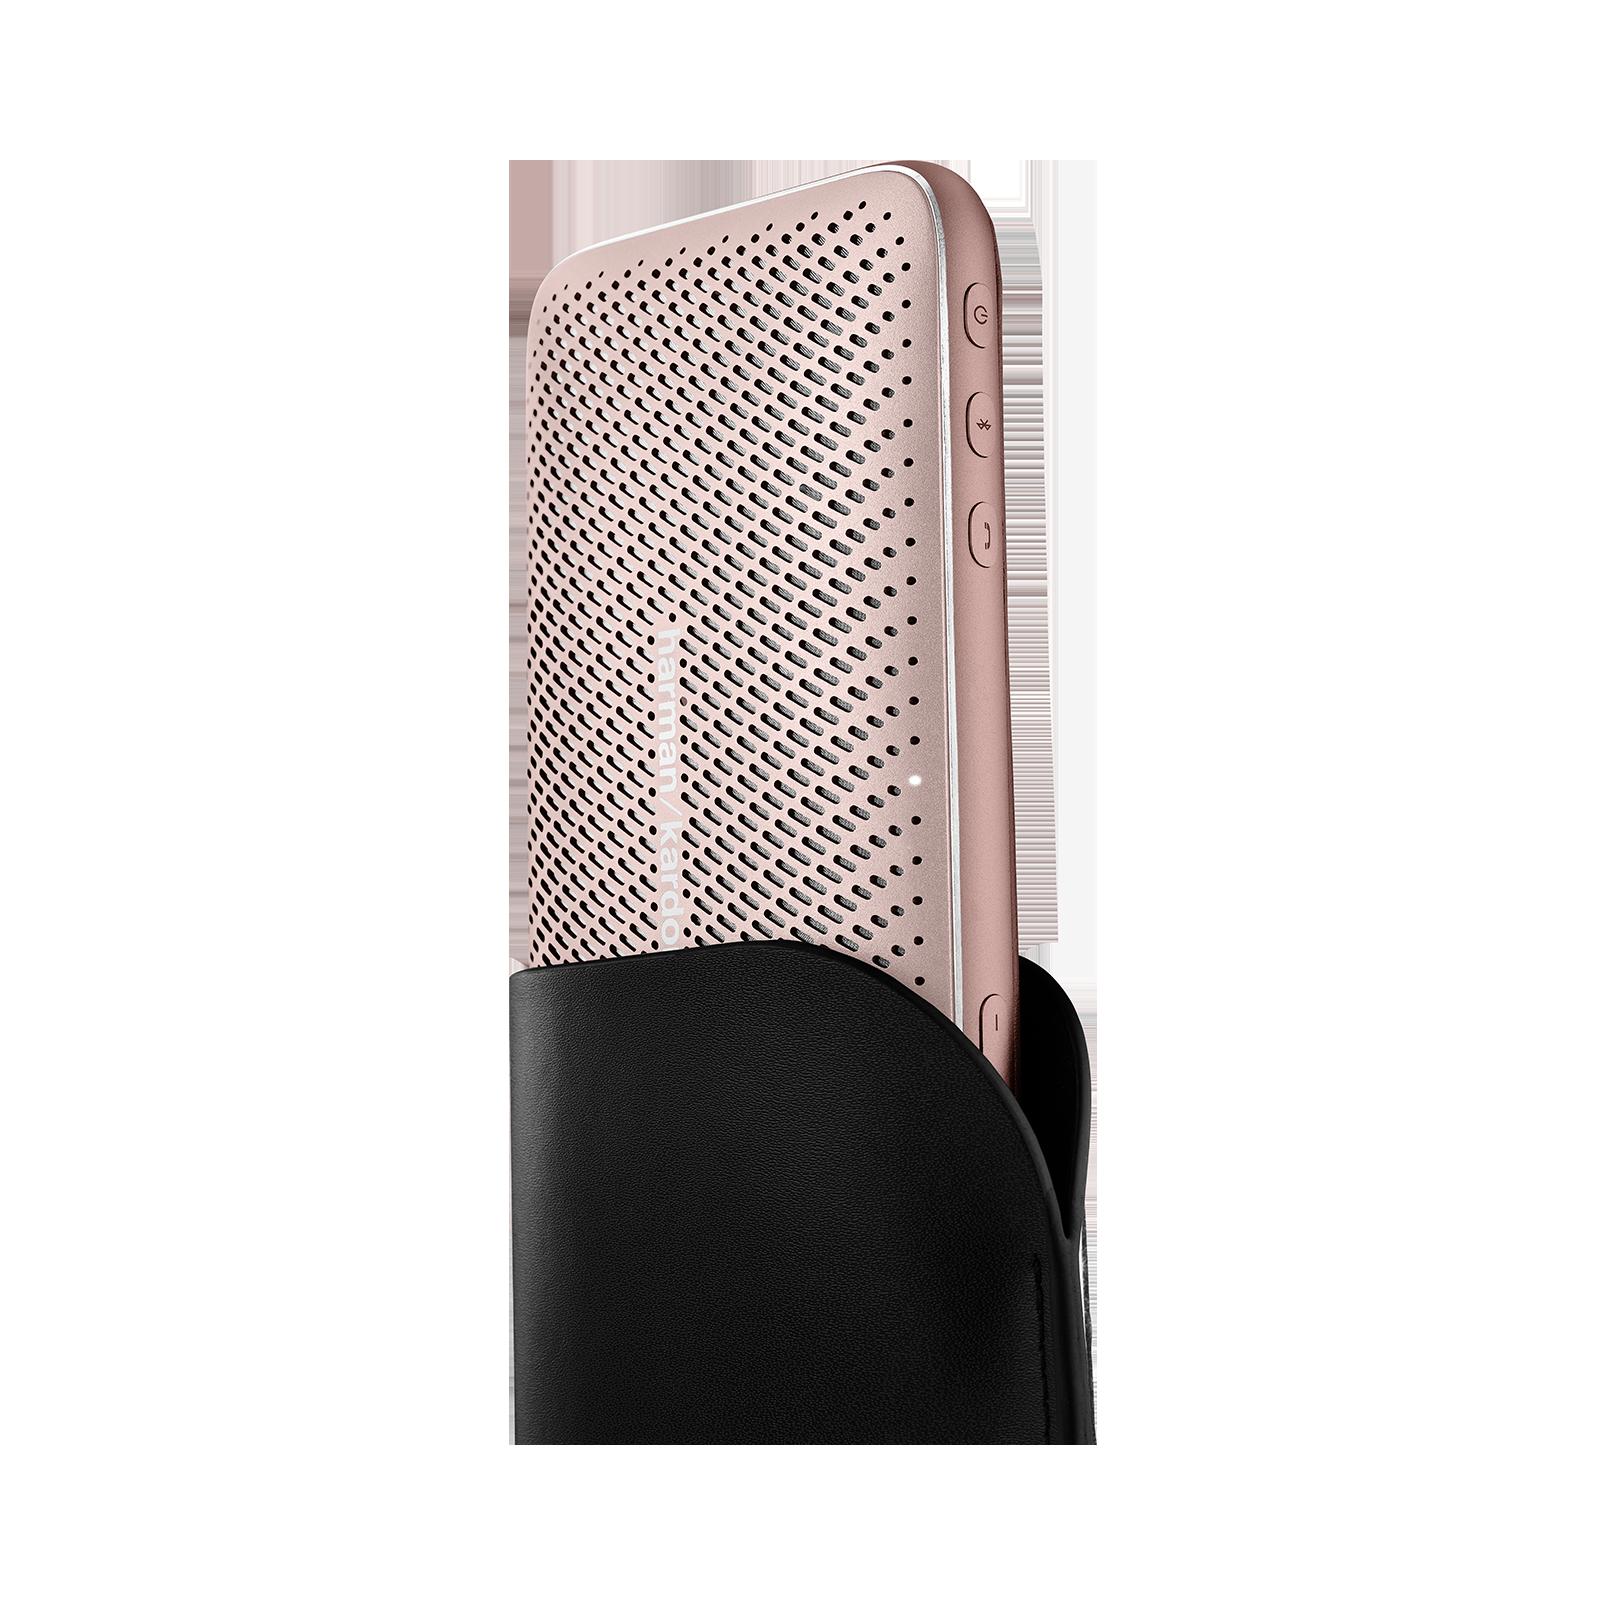 Harman Kardon Esquire Mini 2 - Gold - Ultra-slim and portable premium Bluetooth Speaker - Detailshot 1